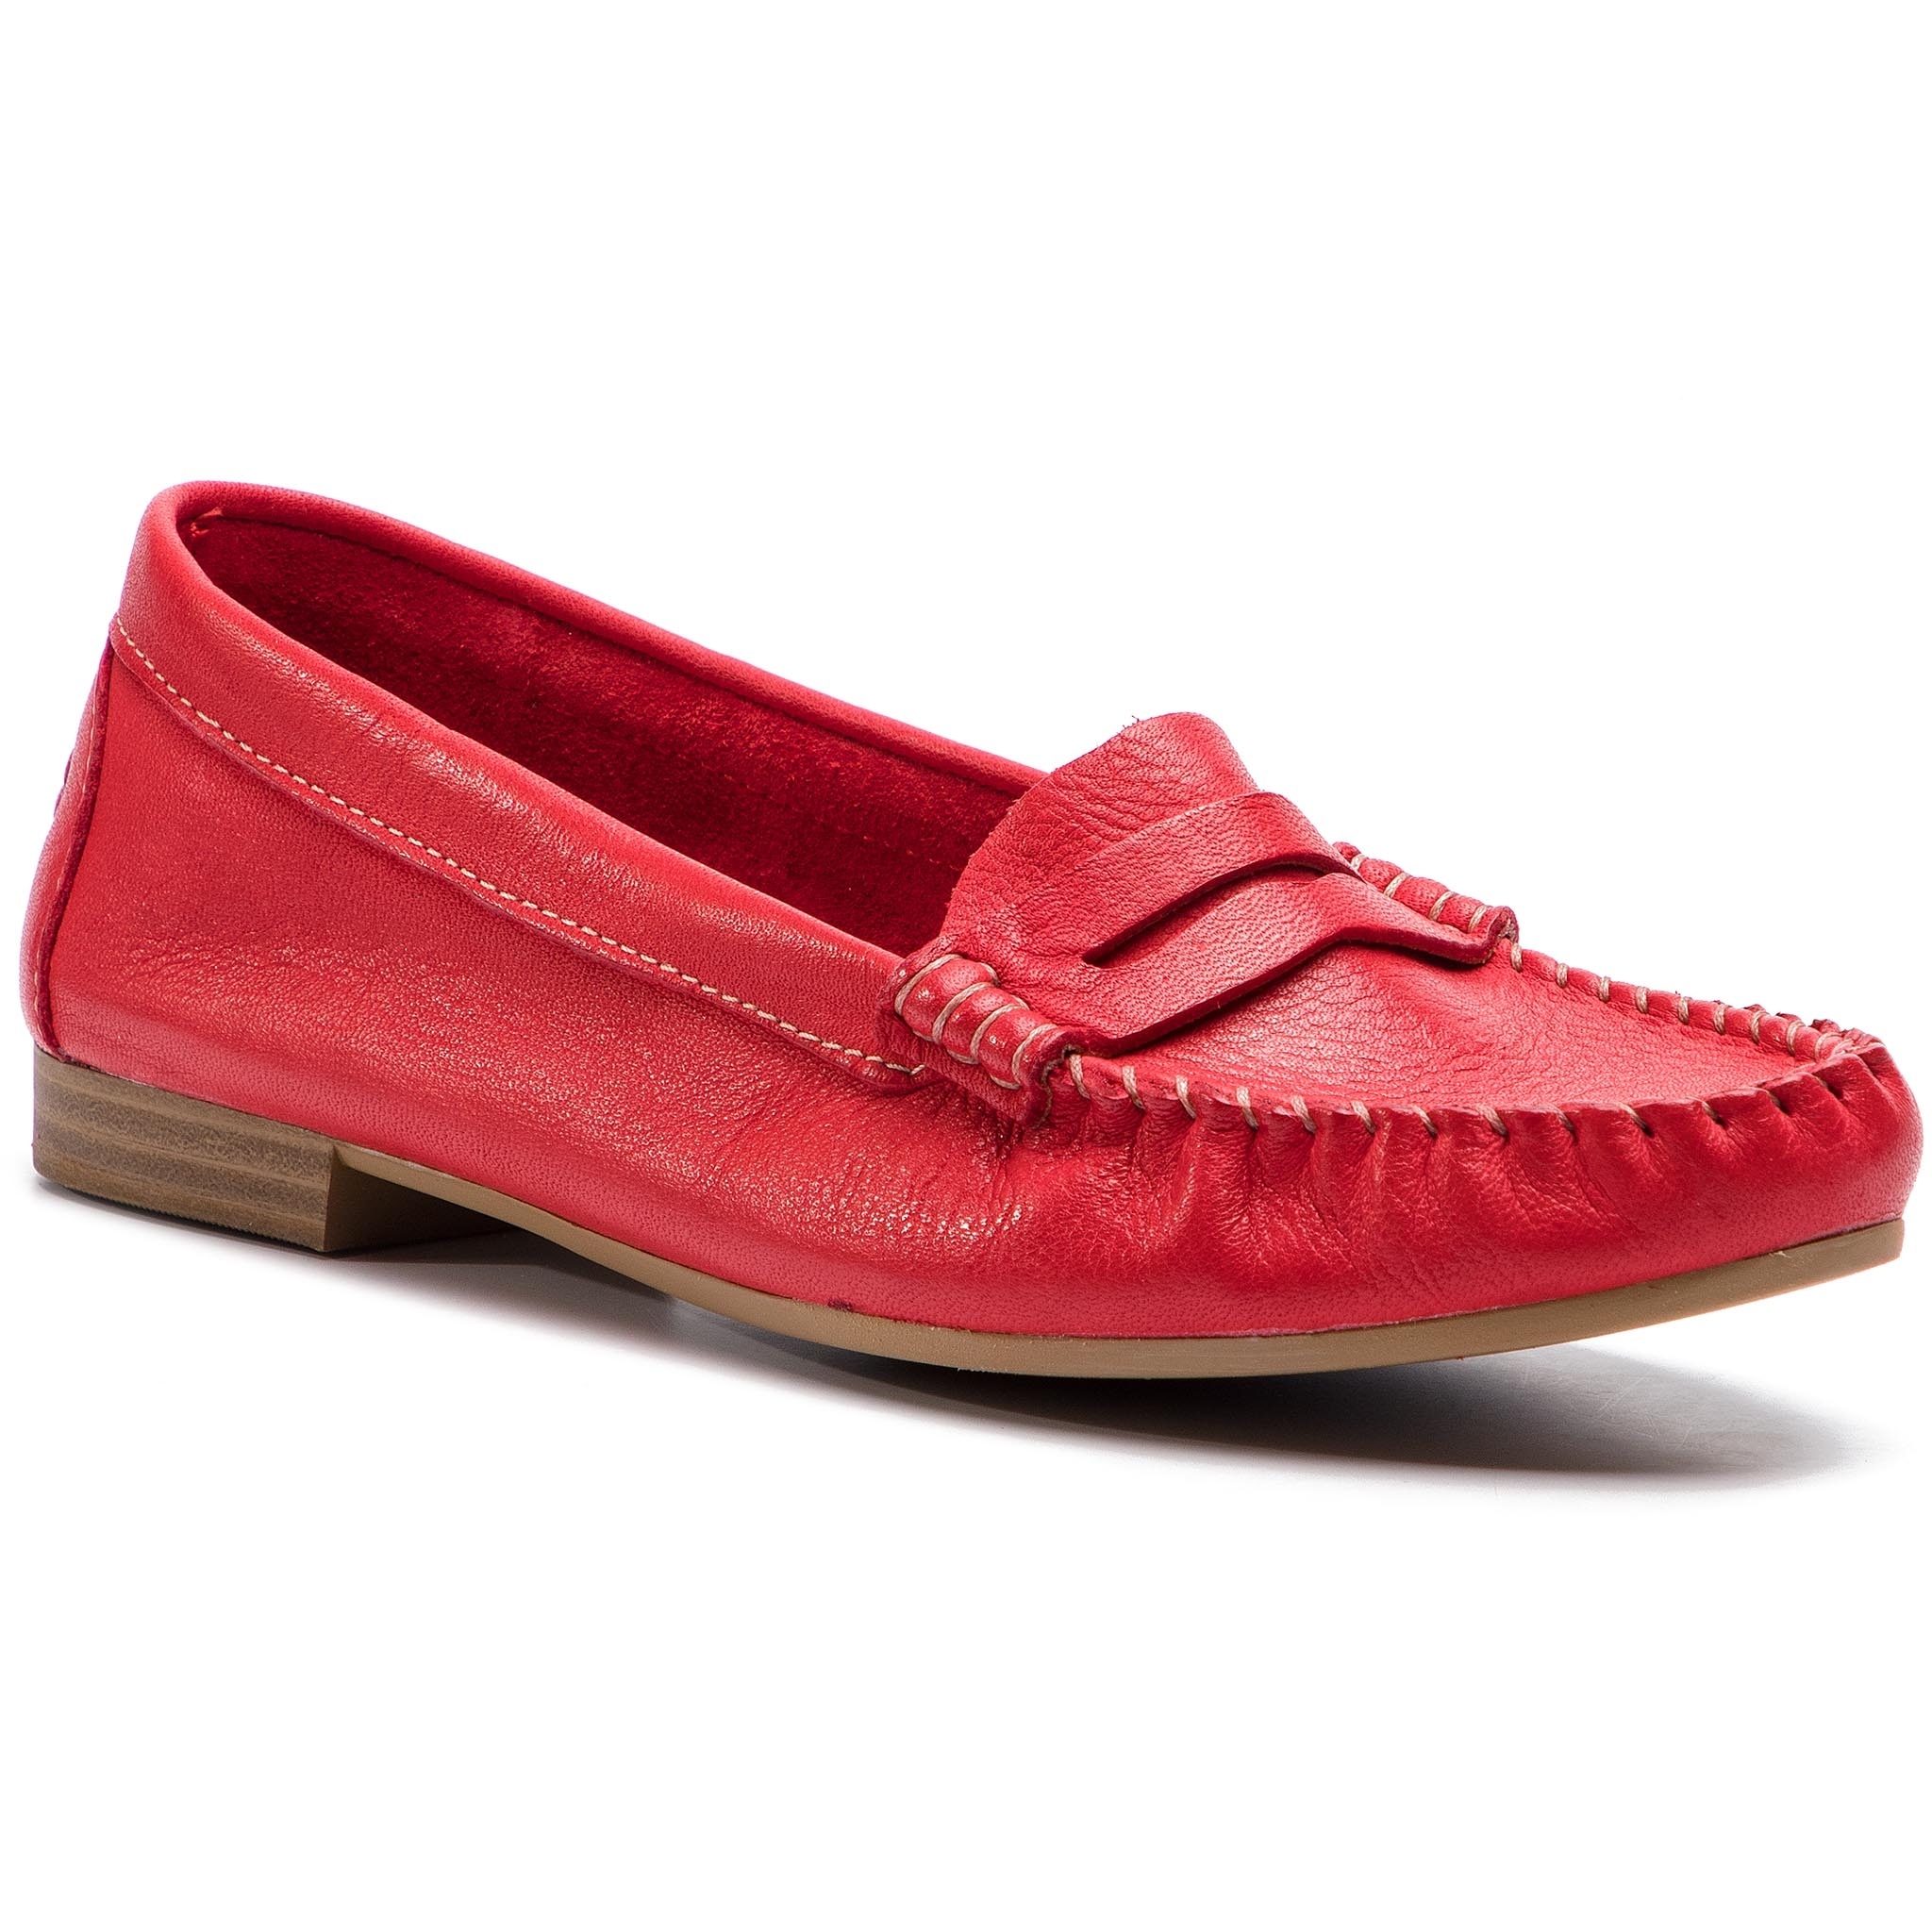 Mokaszin TAMARIS - 1-24213-22 Red 500 - Glami.hu fda97e7186